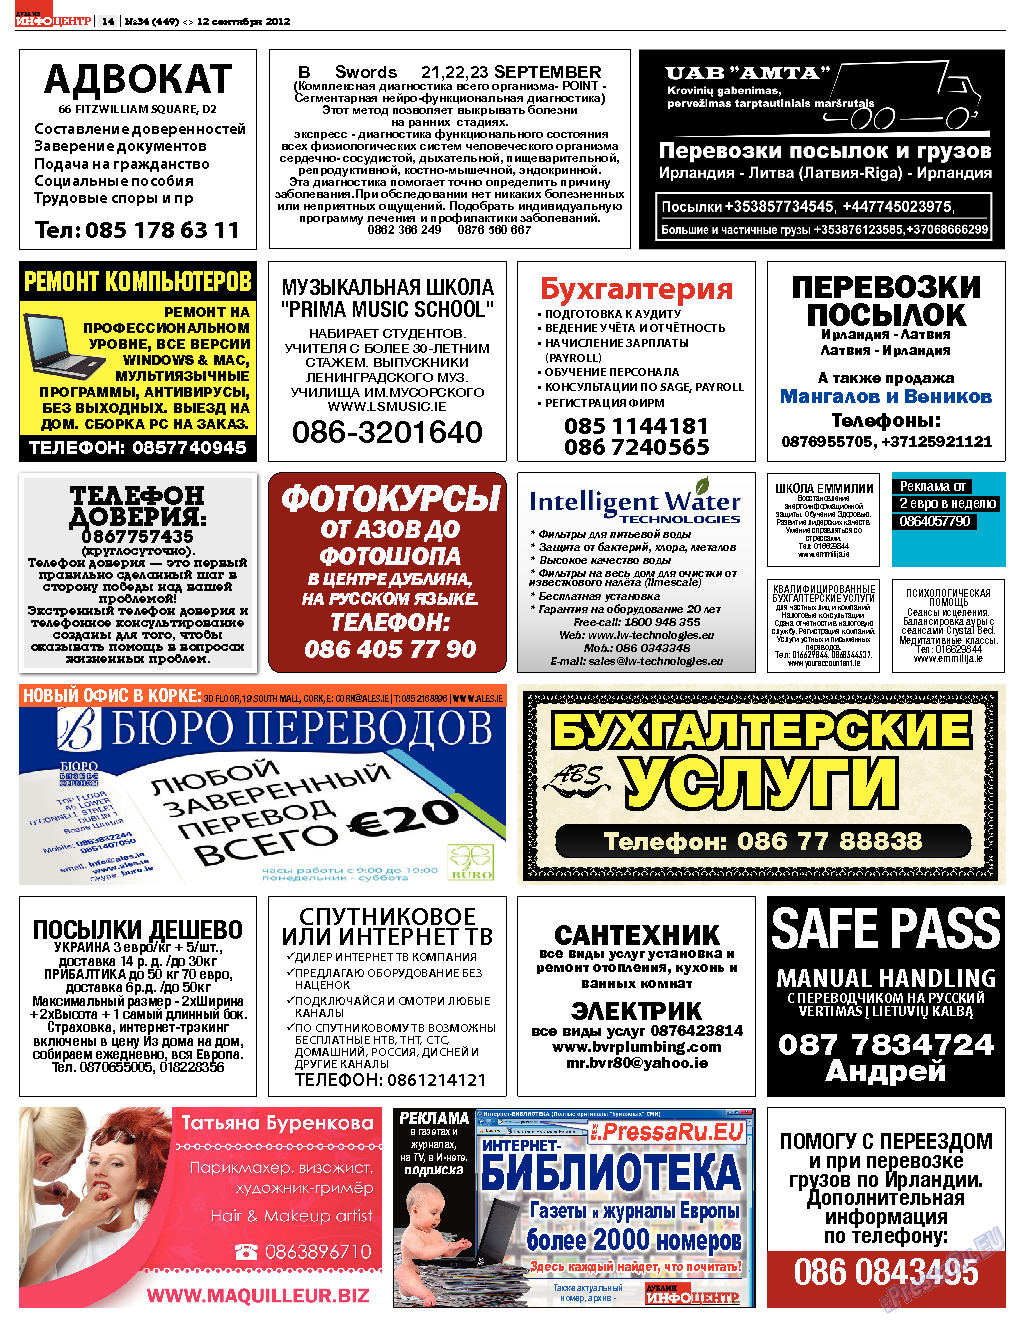 Дублин инфоцентр (газета). 2012 год, номер 34, стр. 14